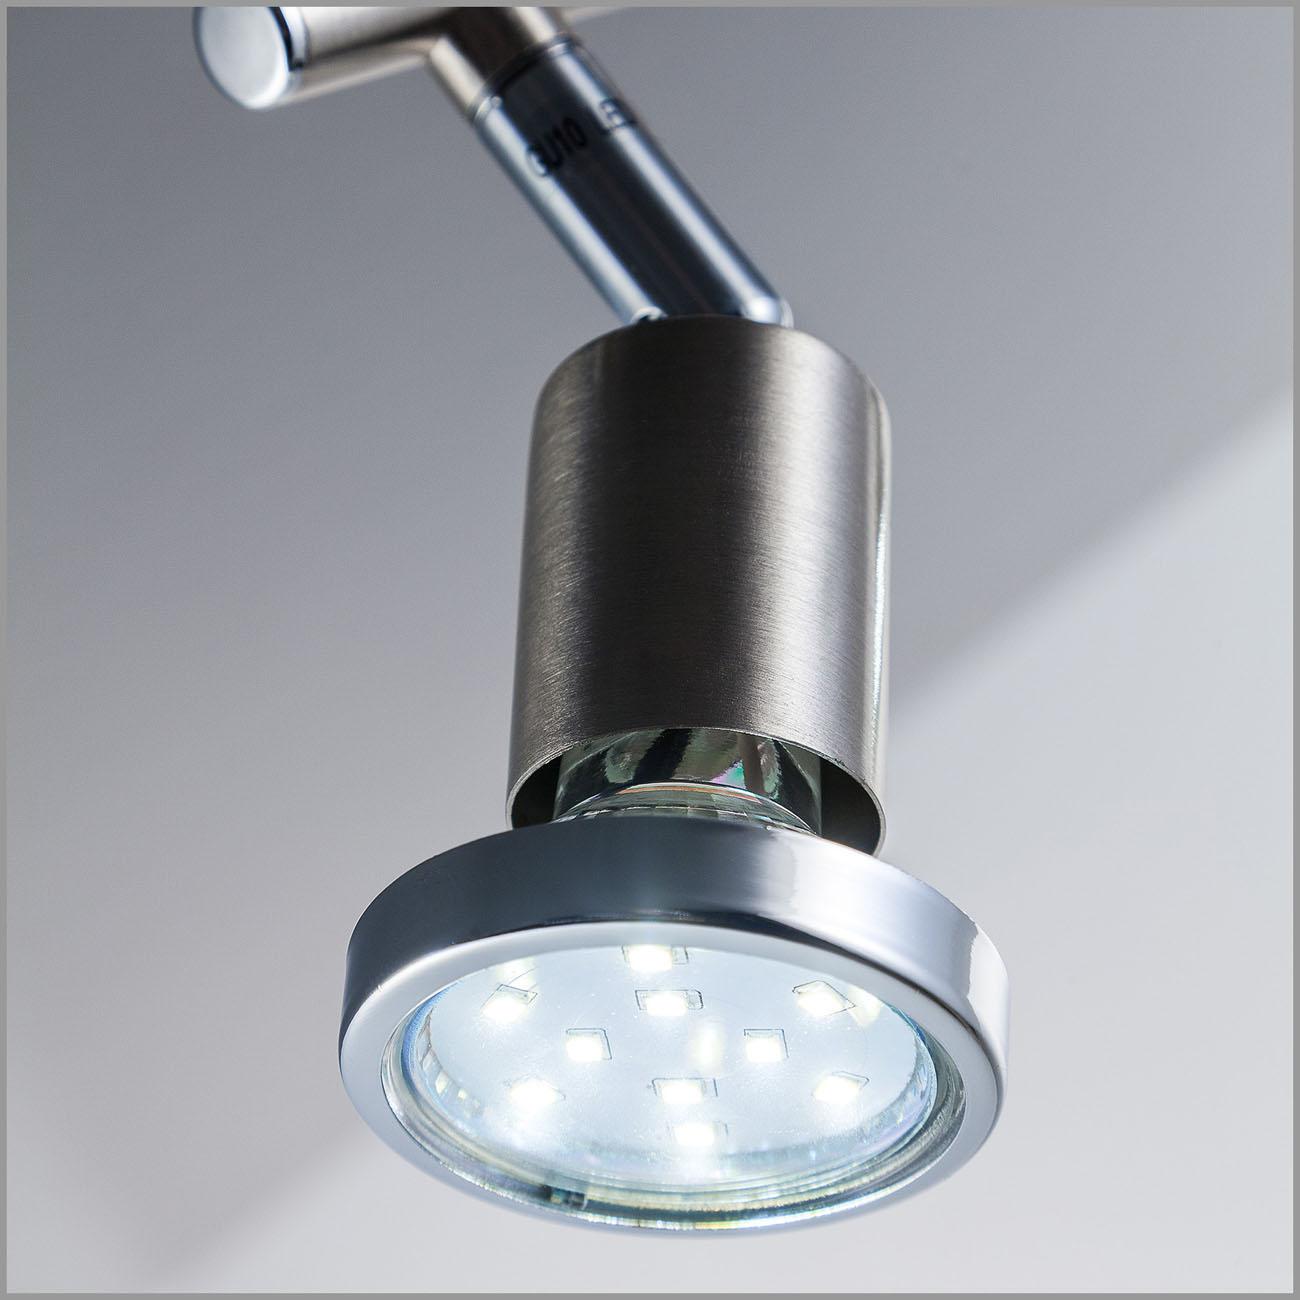 LED Deckenstrahler 2-flammig - 4